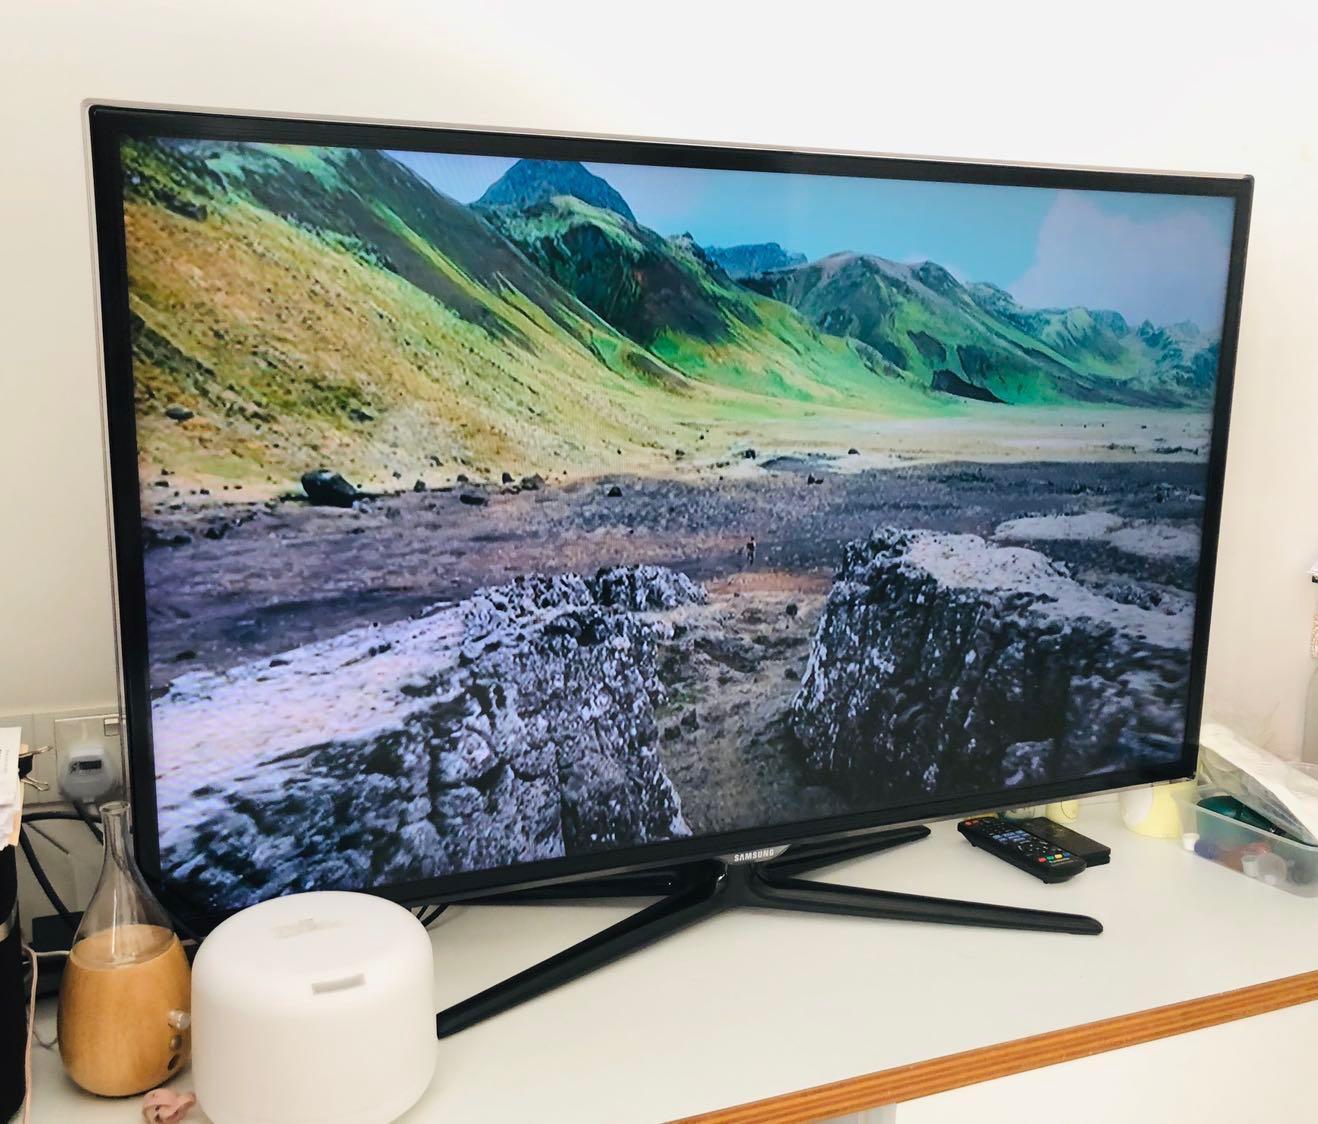 Nieuw Samsung 46 inch Smart TV, Home Appliances, TVs & Entertainment DF-98